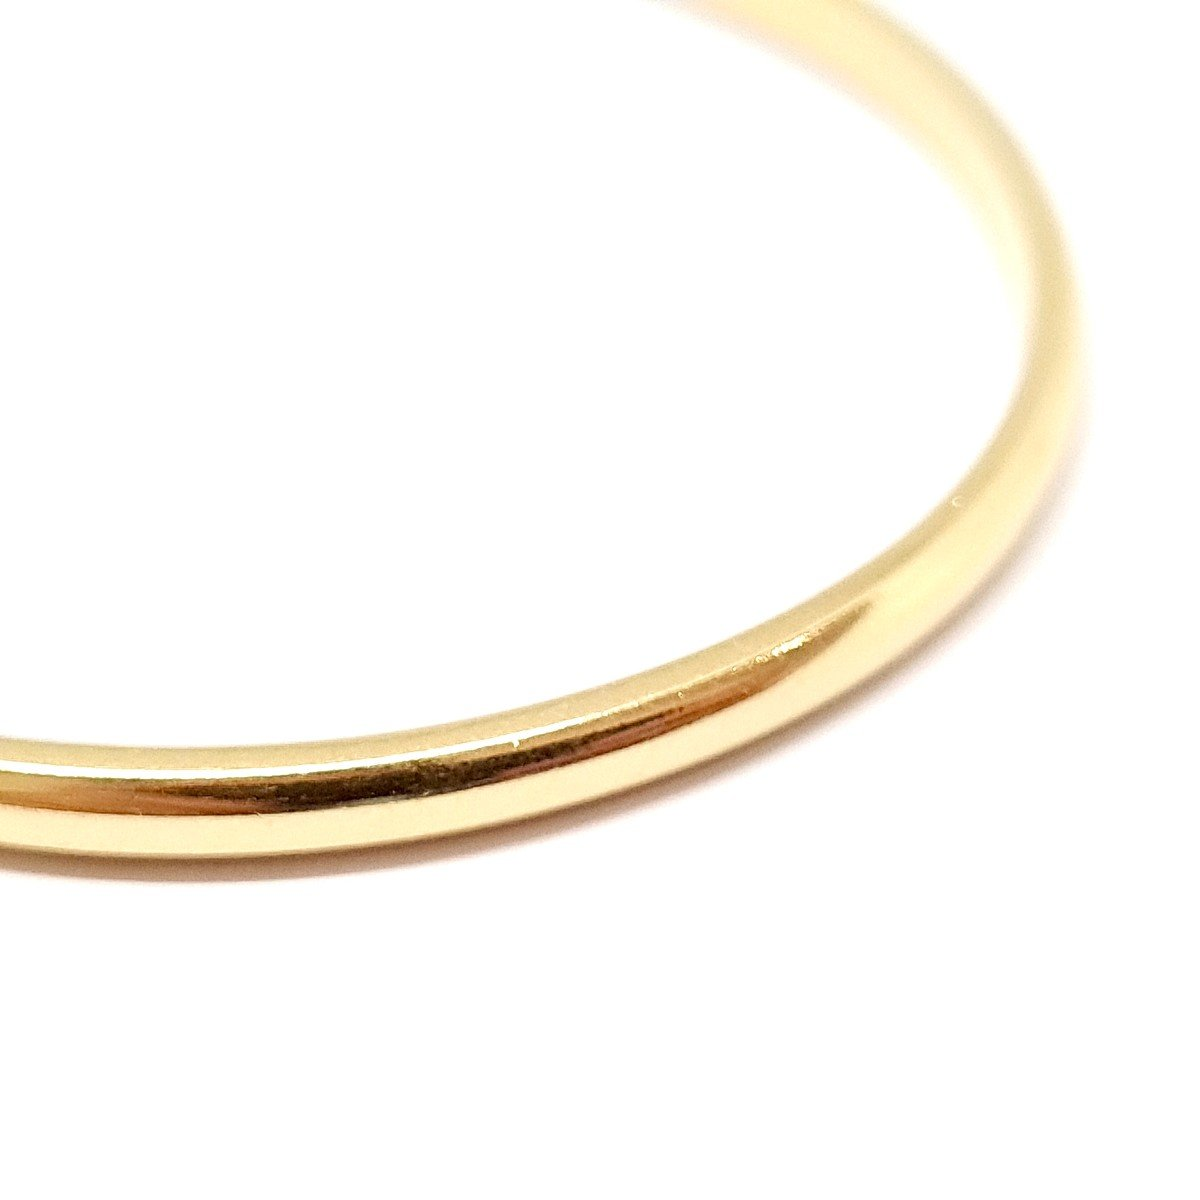 18k Yellow Gold Rigid Bangle Bracelet-photo-1